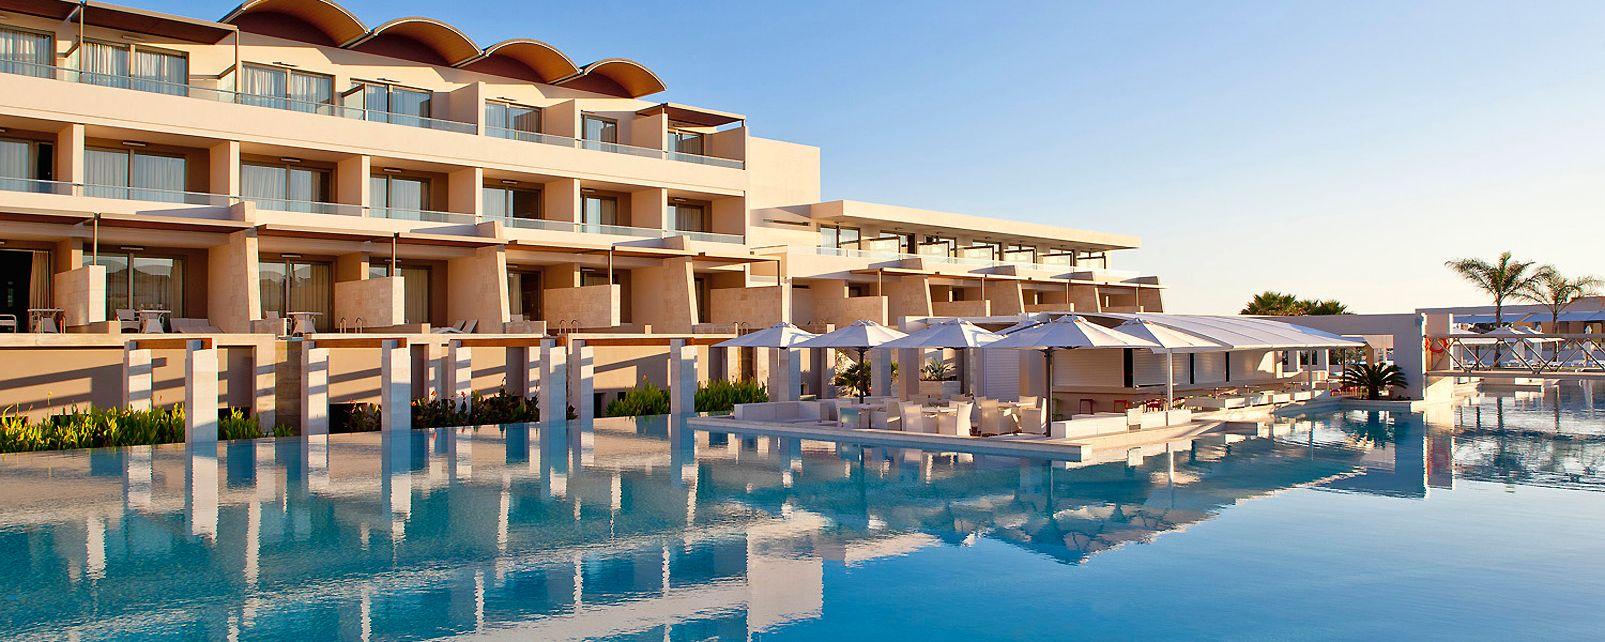 Hotel Avra Imperial